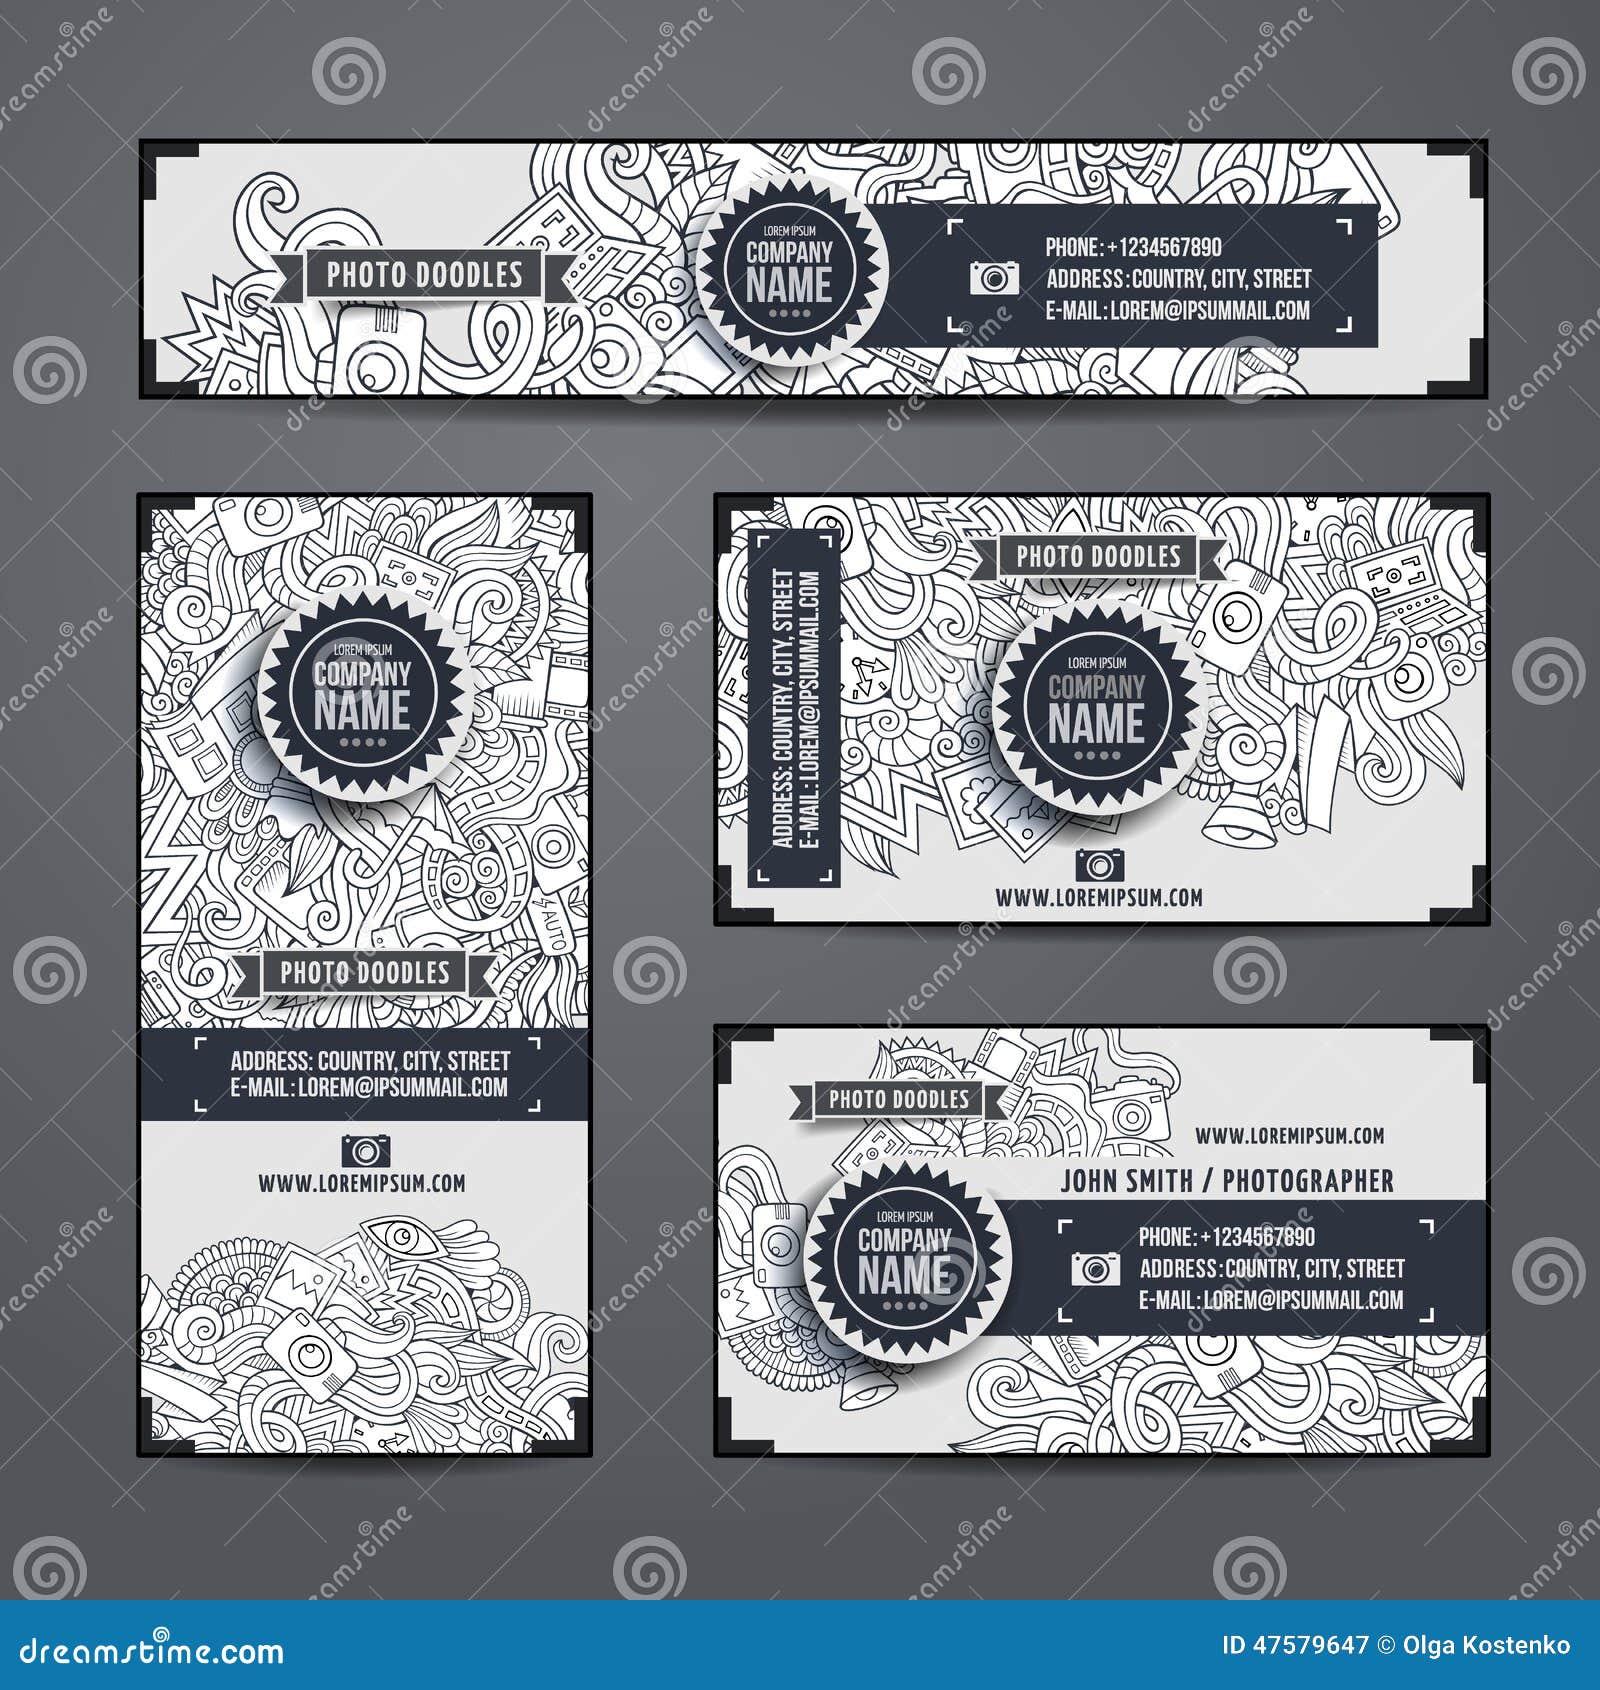 Corporate Identity Vector Templates Doodles Photo Stock